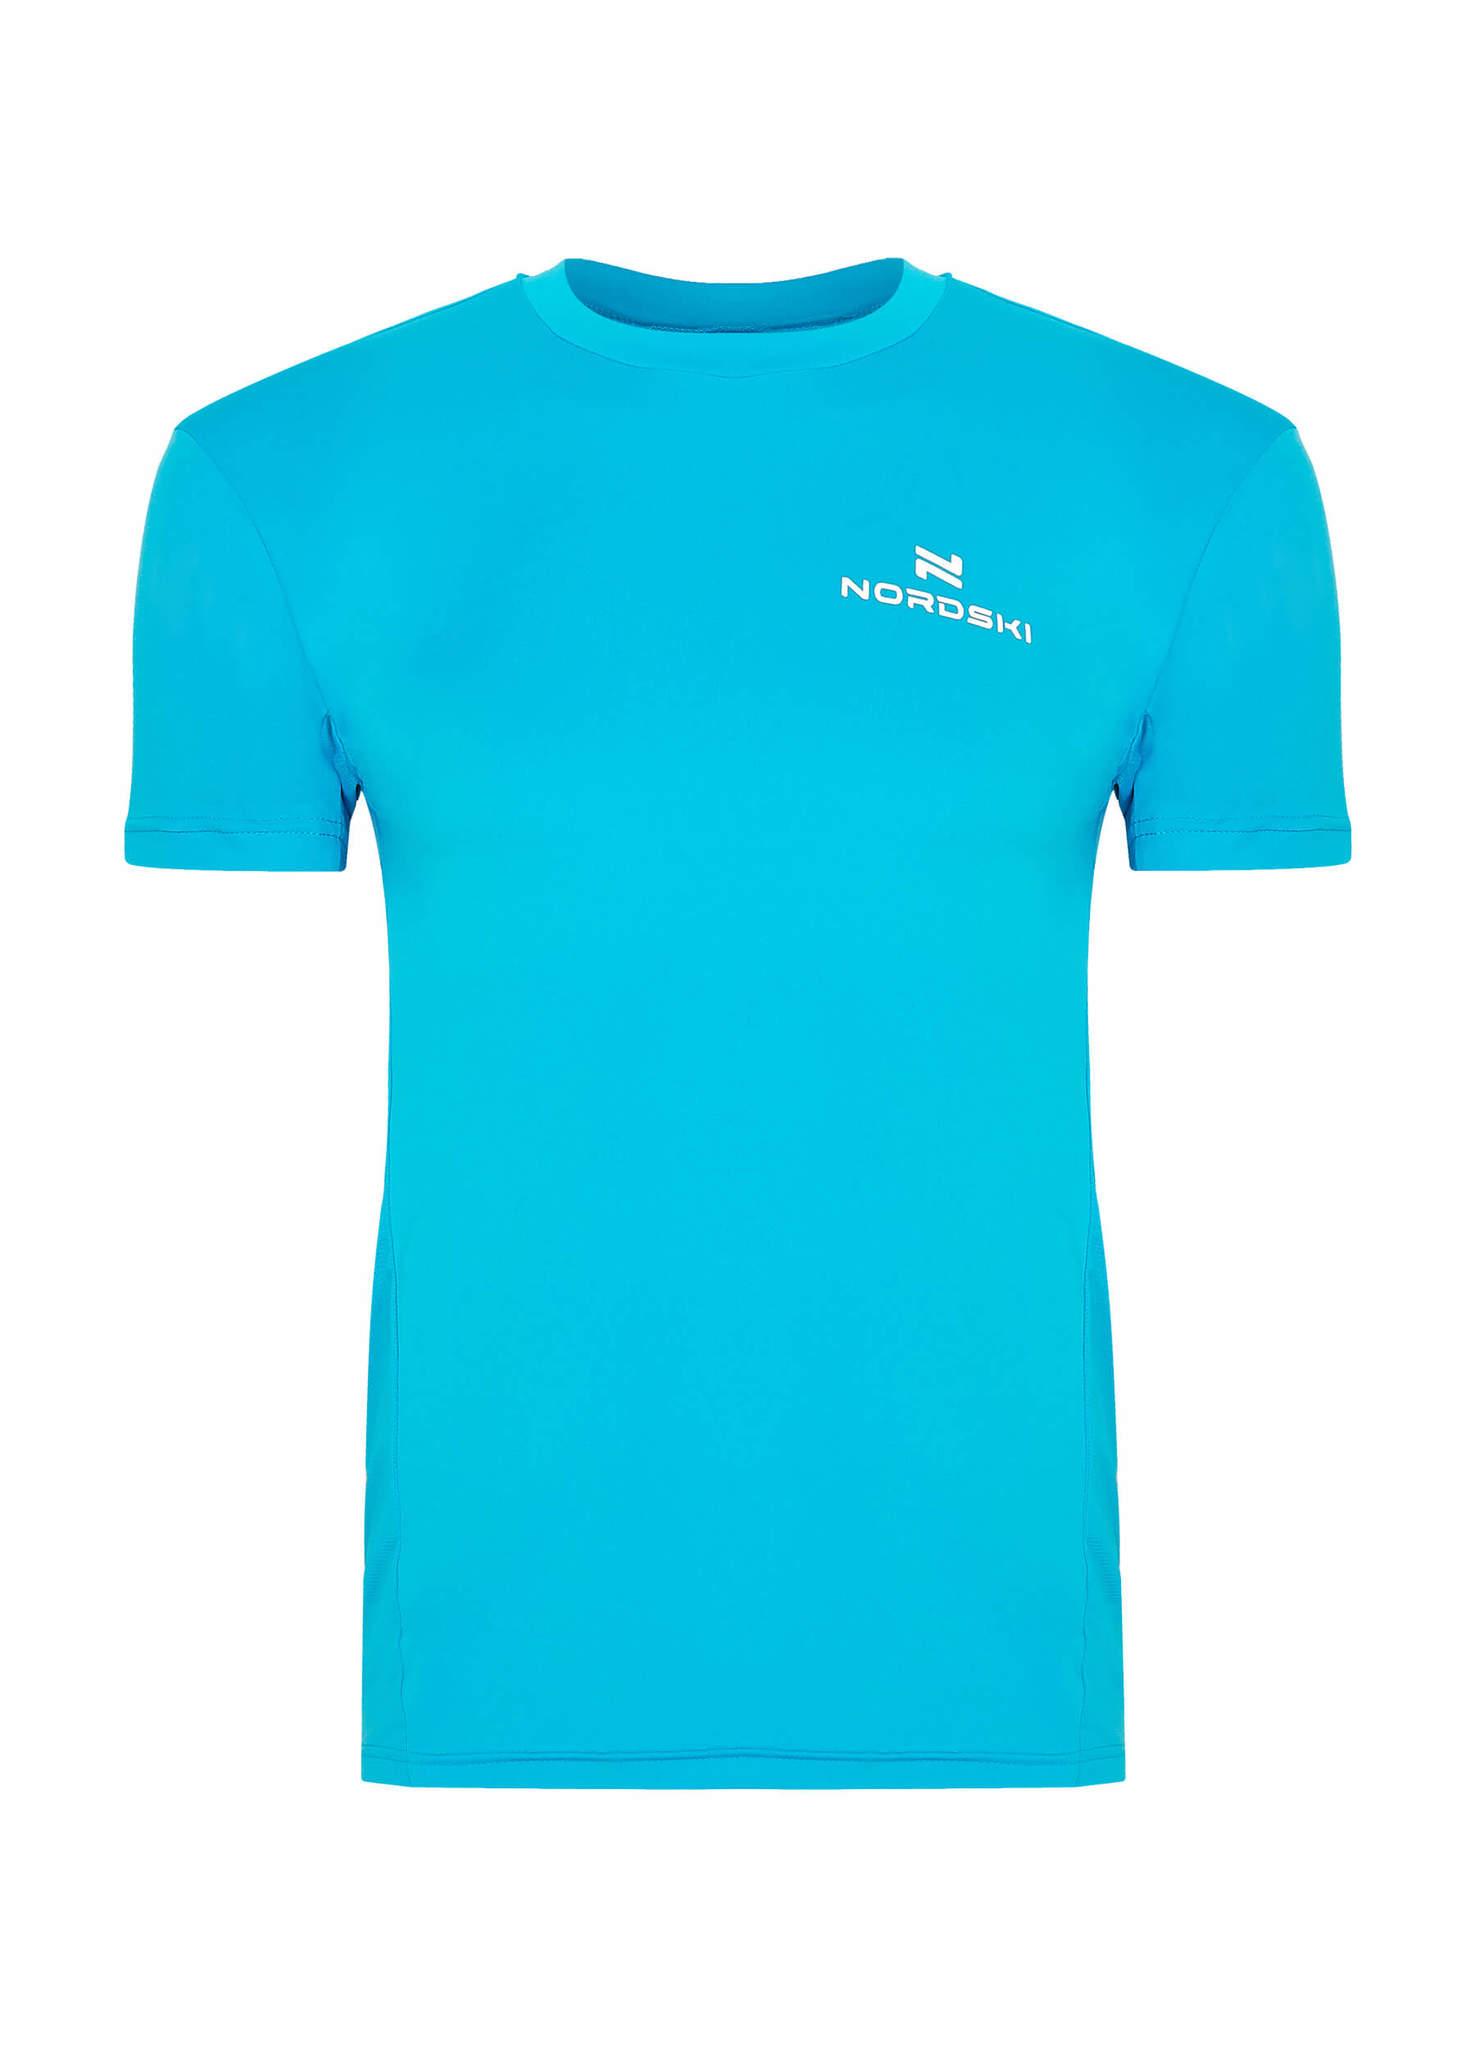 Nordski Sport футболка мужская light blue - 3